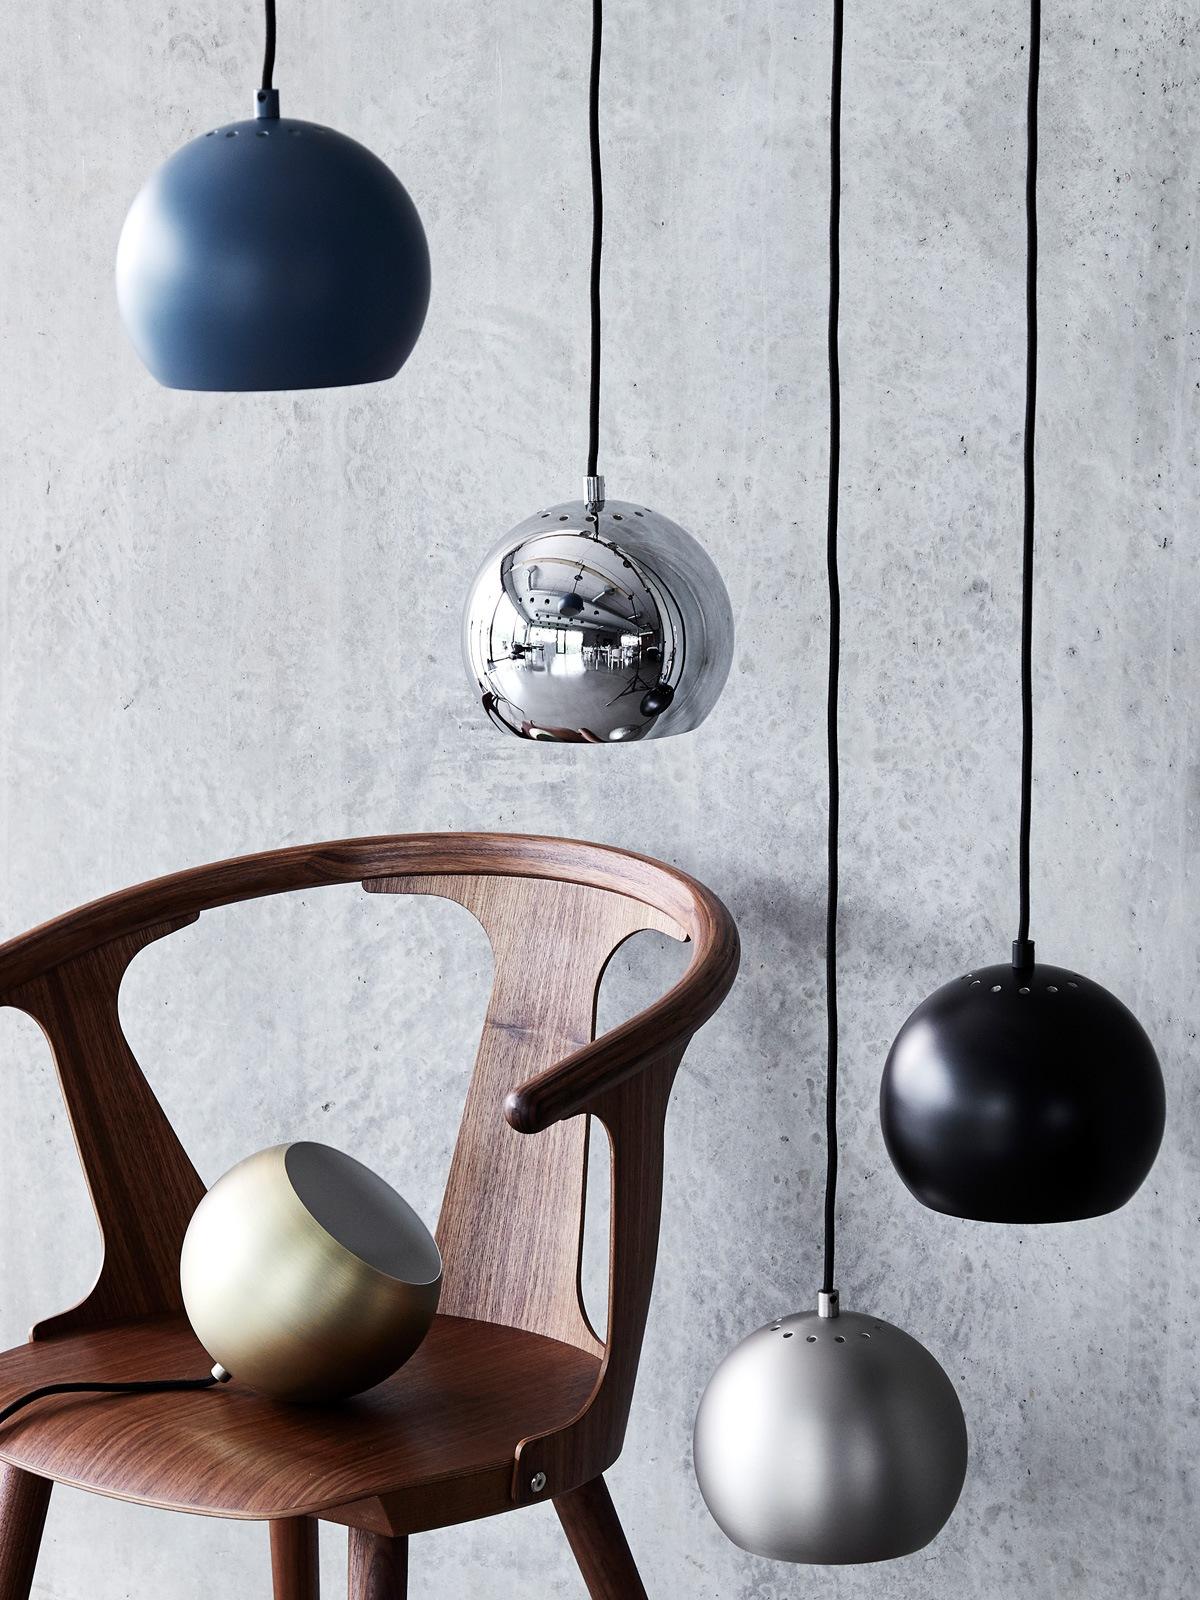 Ball Pendants Frandsen DesignOrt Onlineshop Berlin Lampen